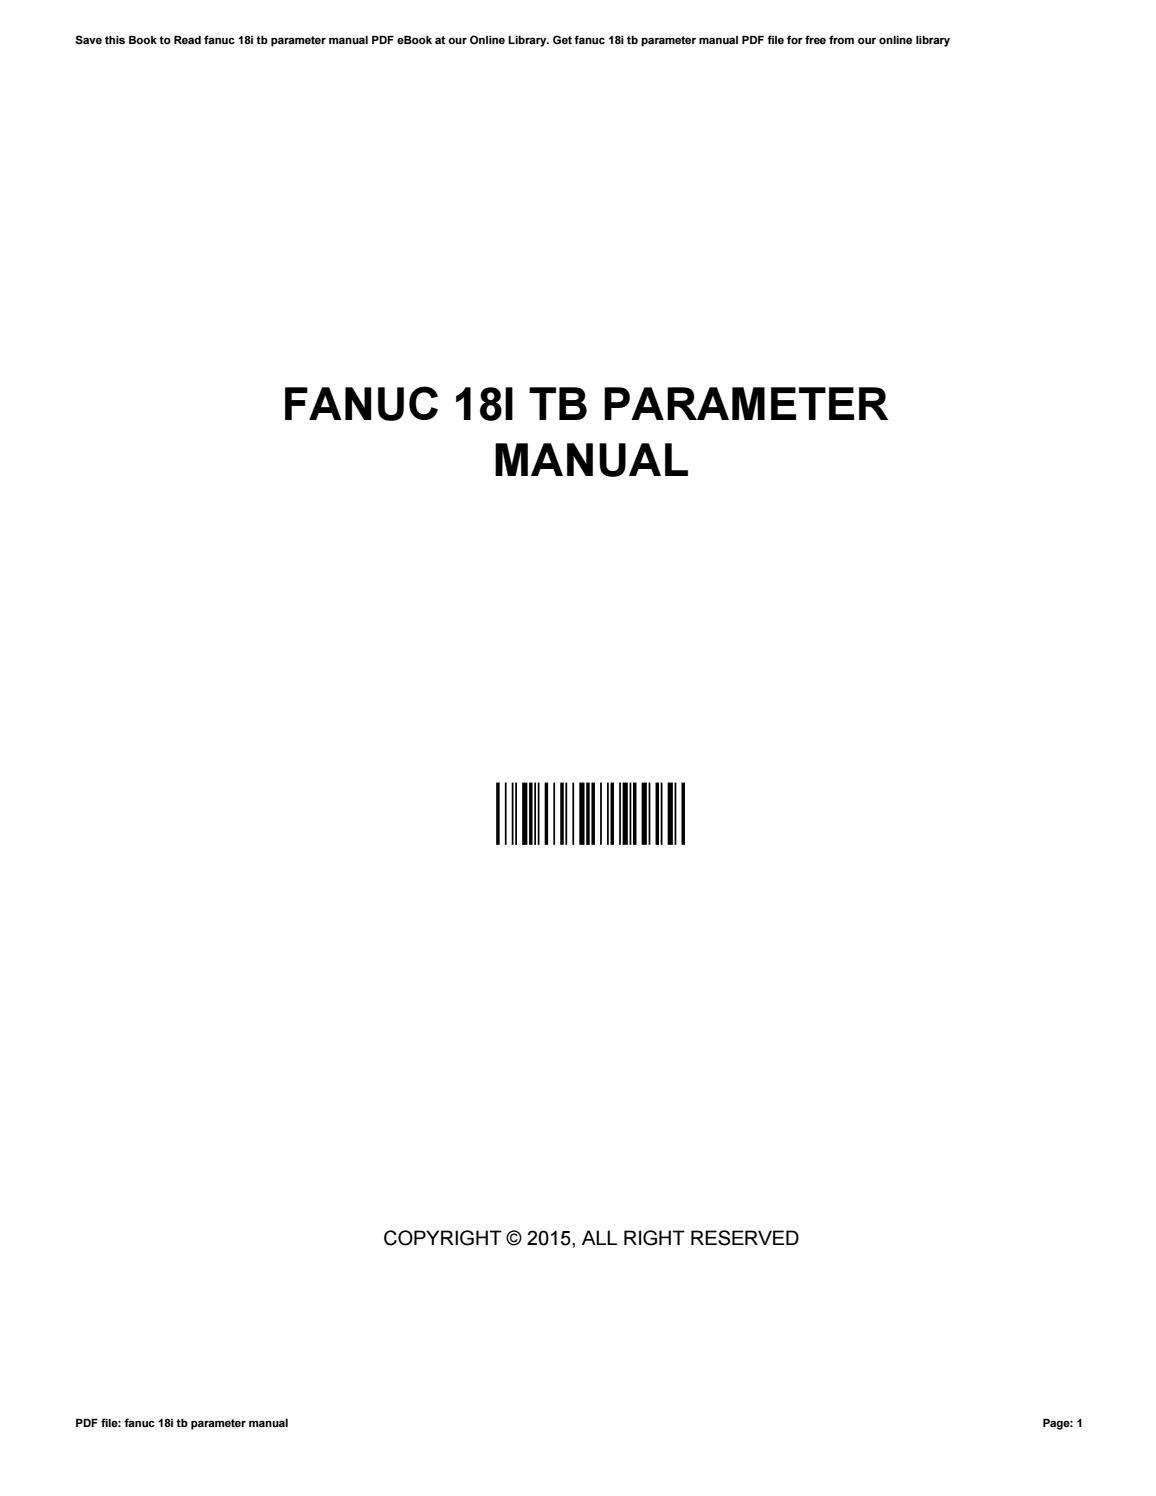 Fanuc om parameter Manual